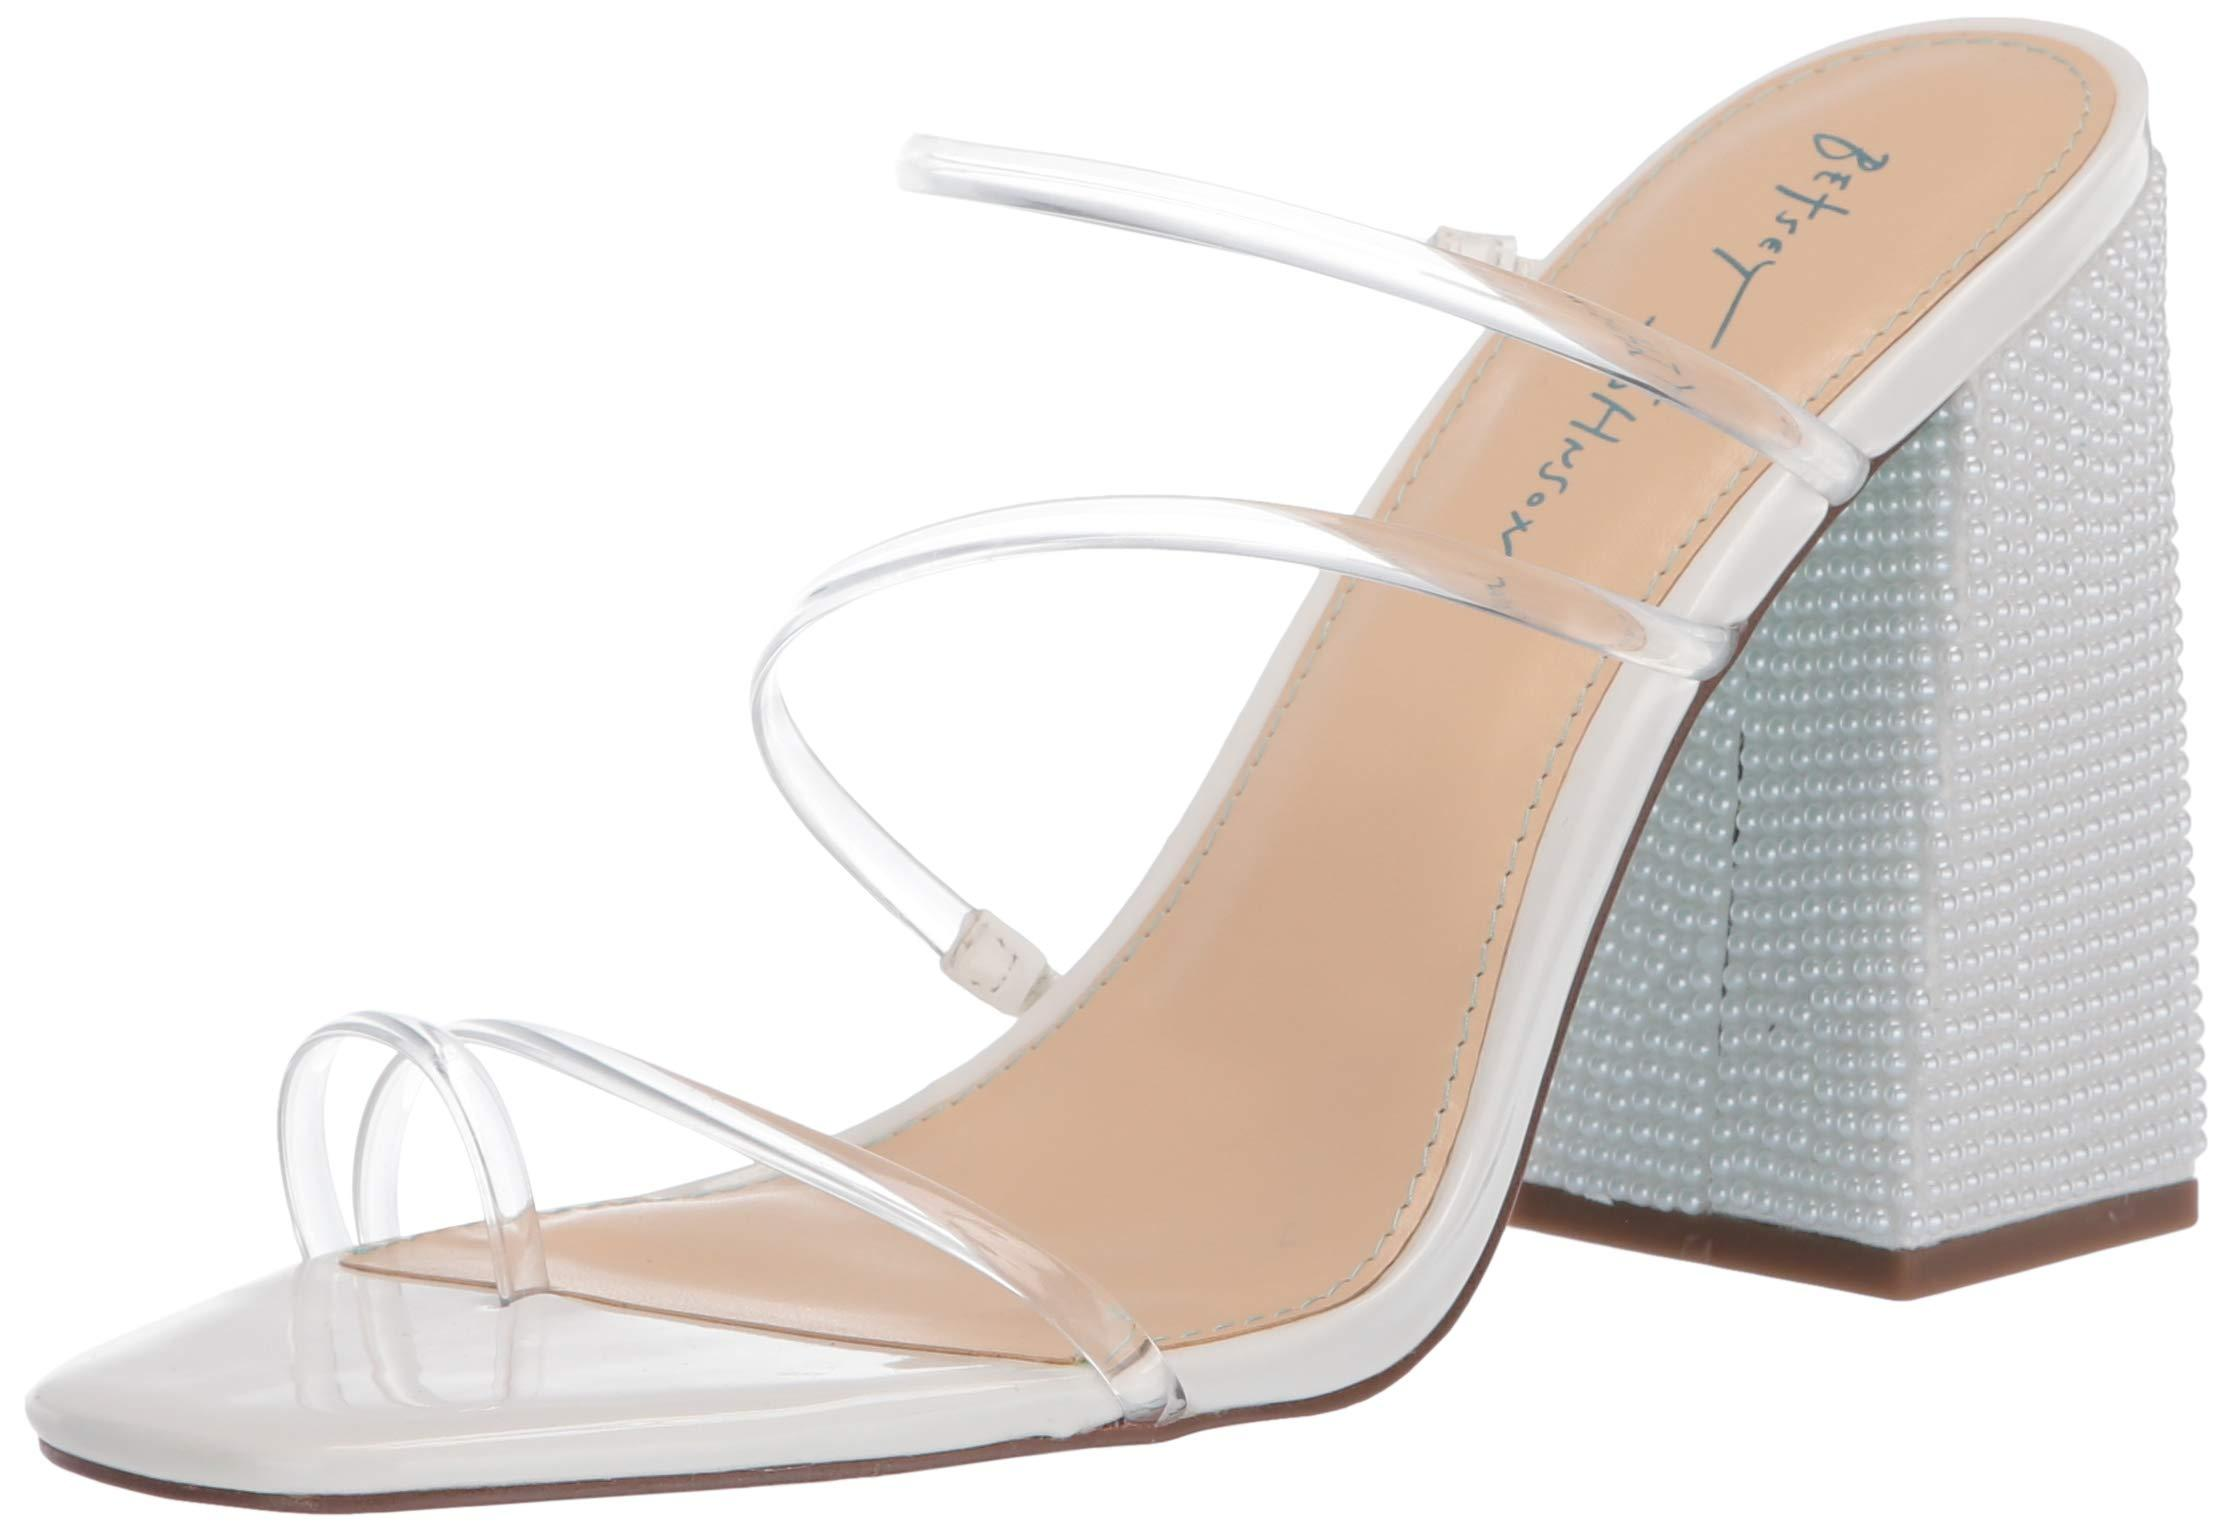 Betsey Johnson Blue Sb-aubri Heeled Sandal in Gold